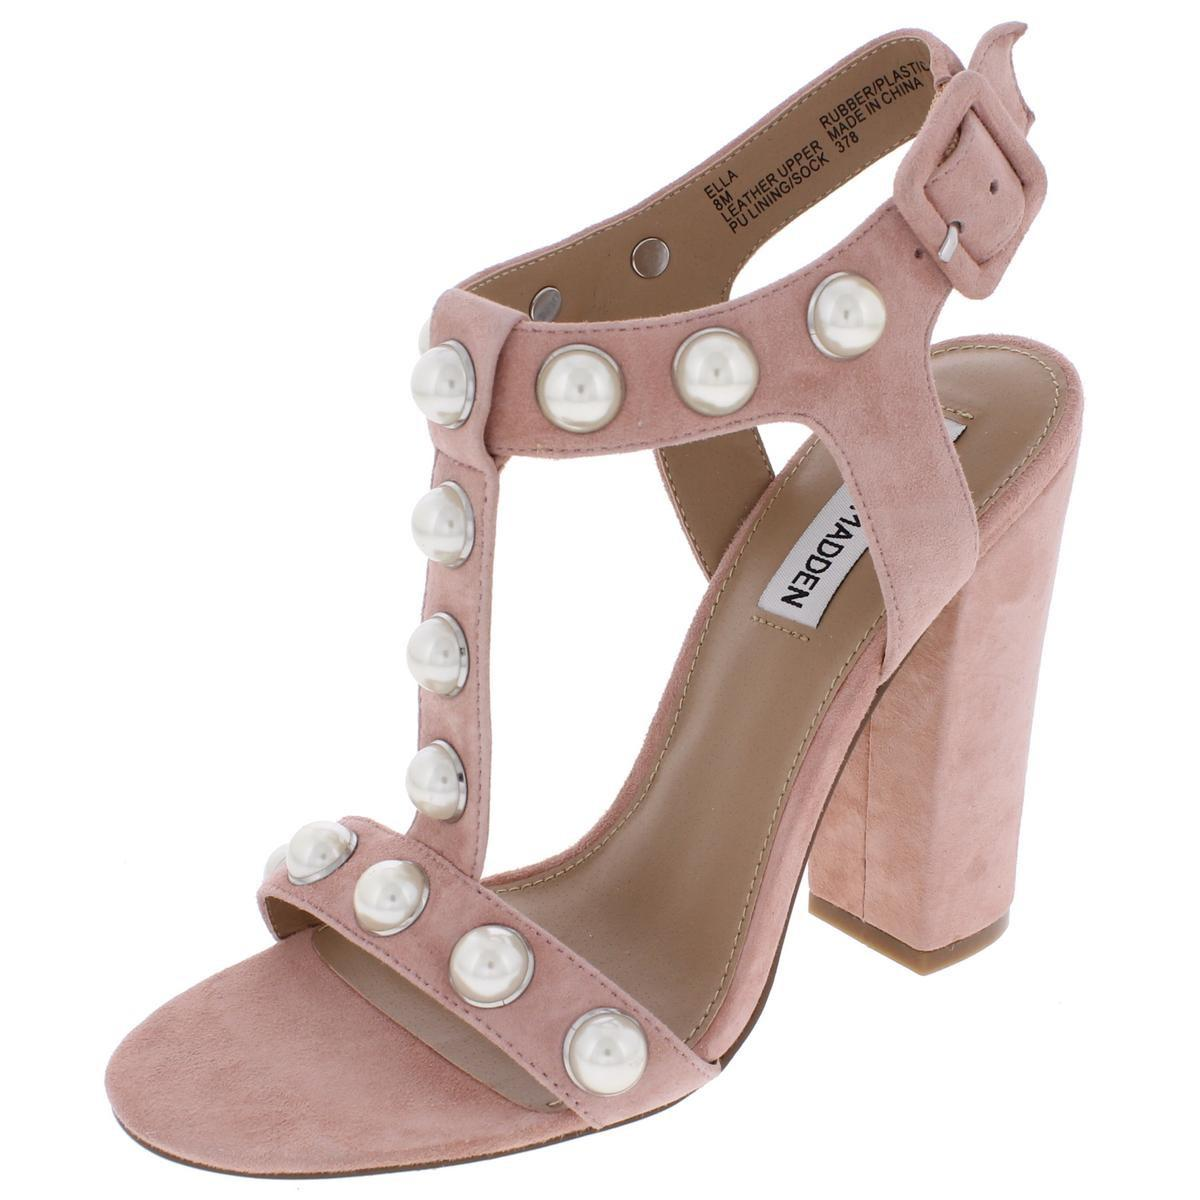 9ccf32cd9e309 Lyst - Steve Madden Ella Open Toe T-strap Dress Sandals